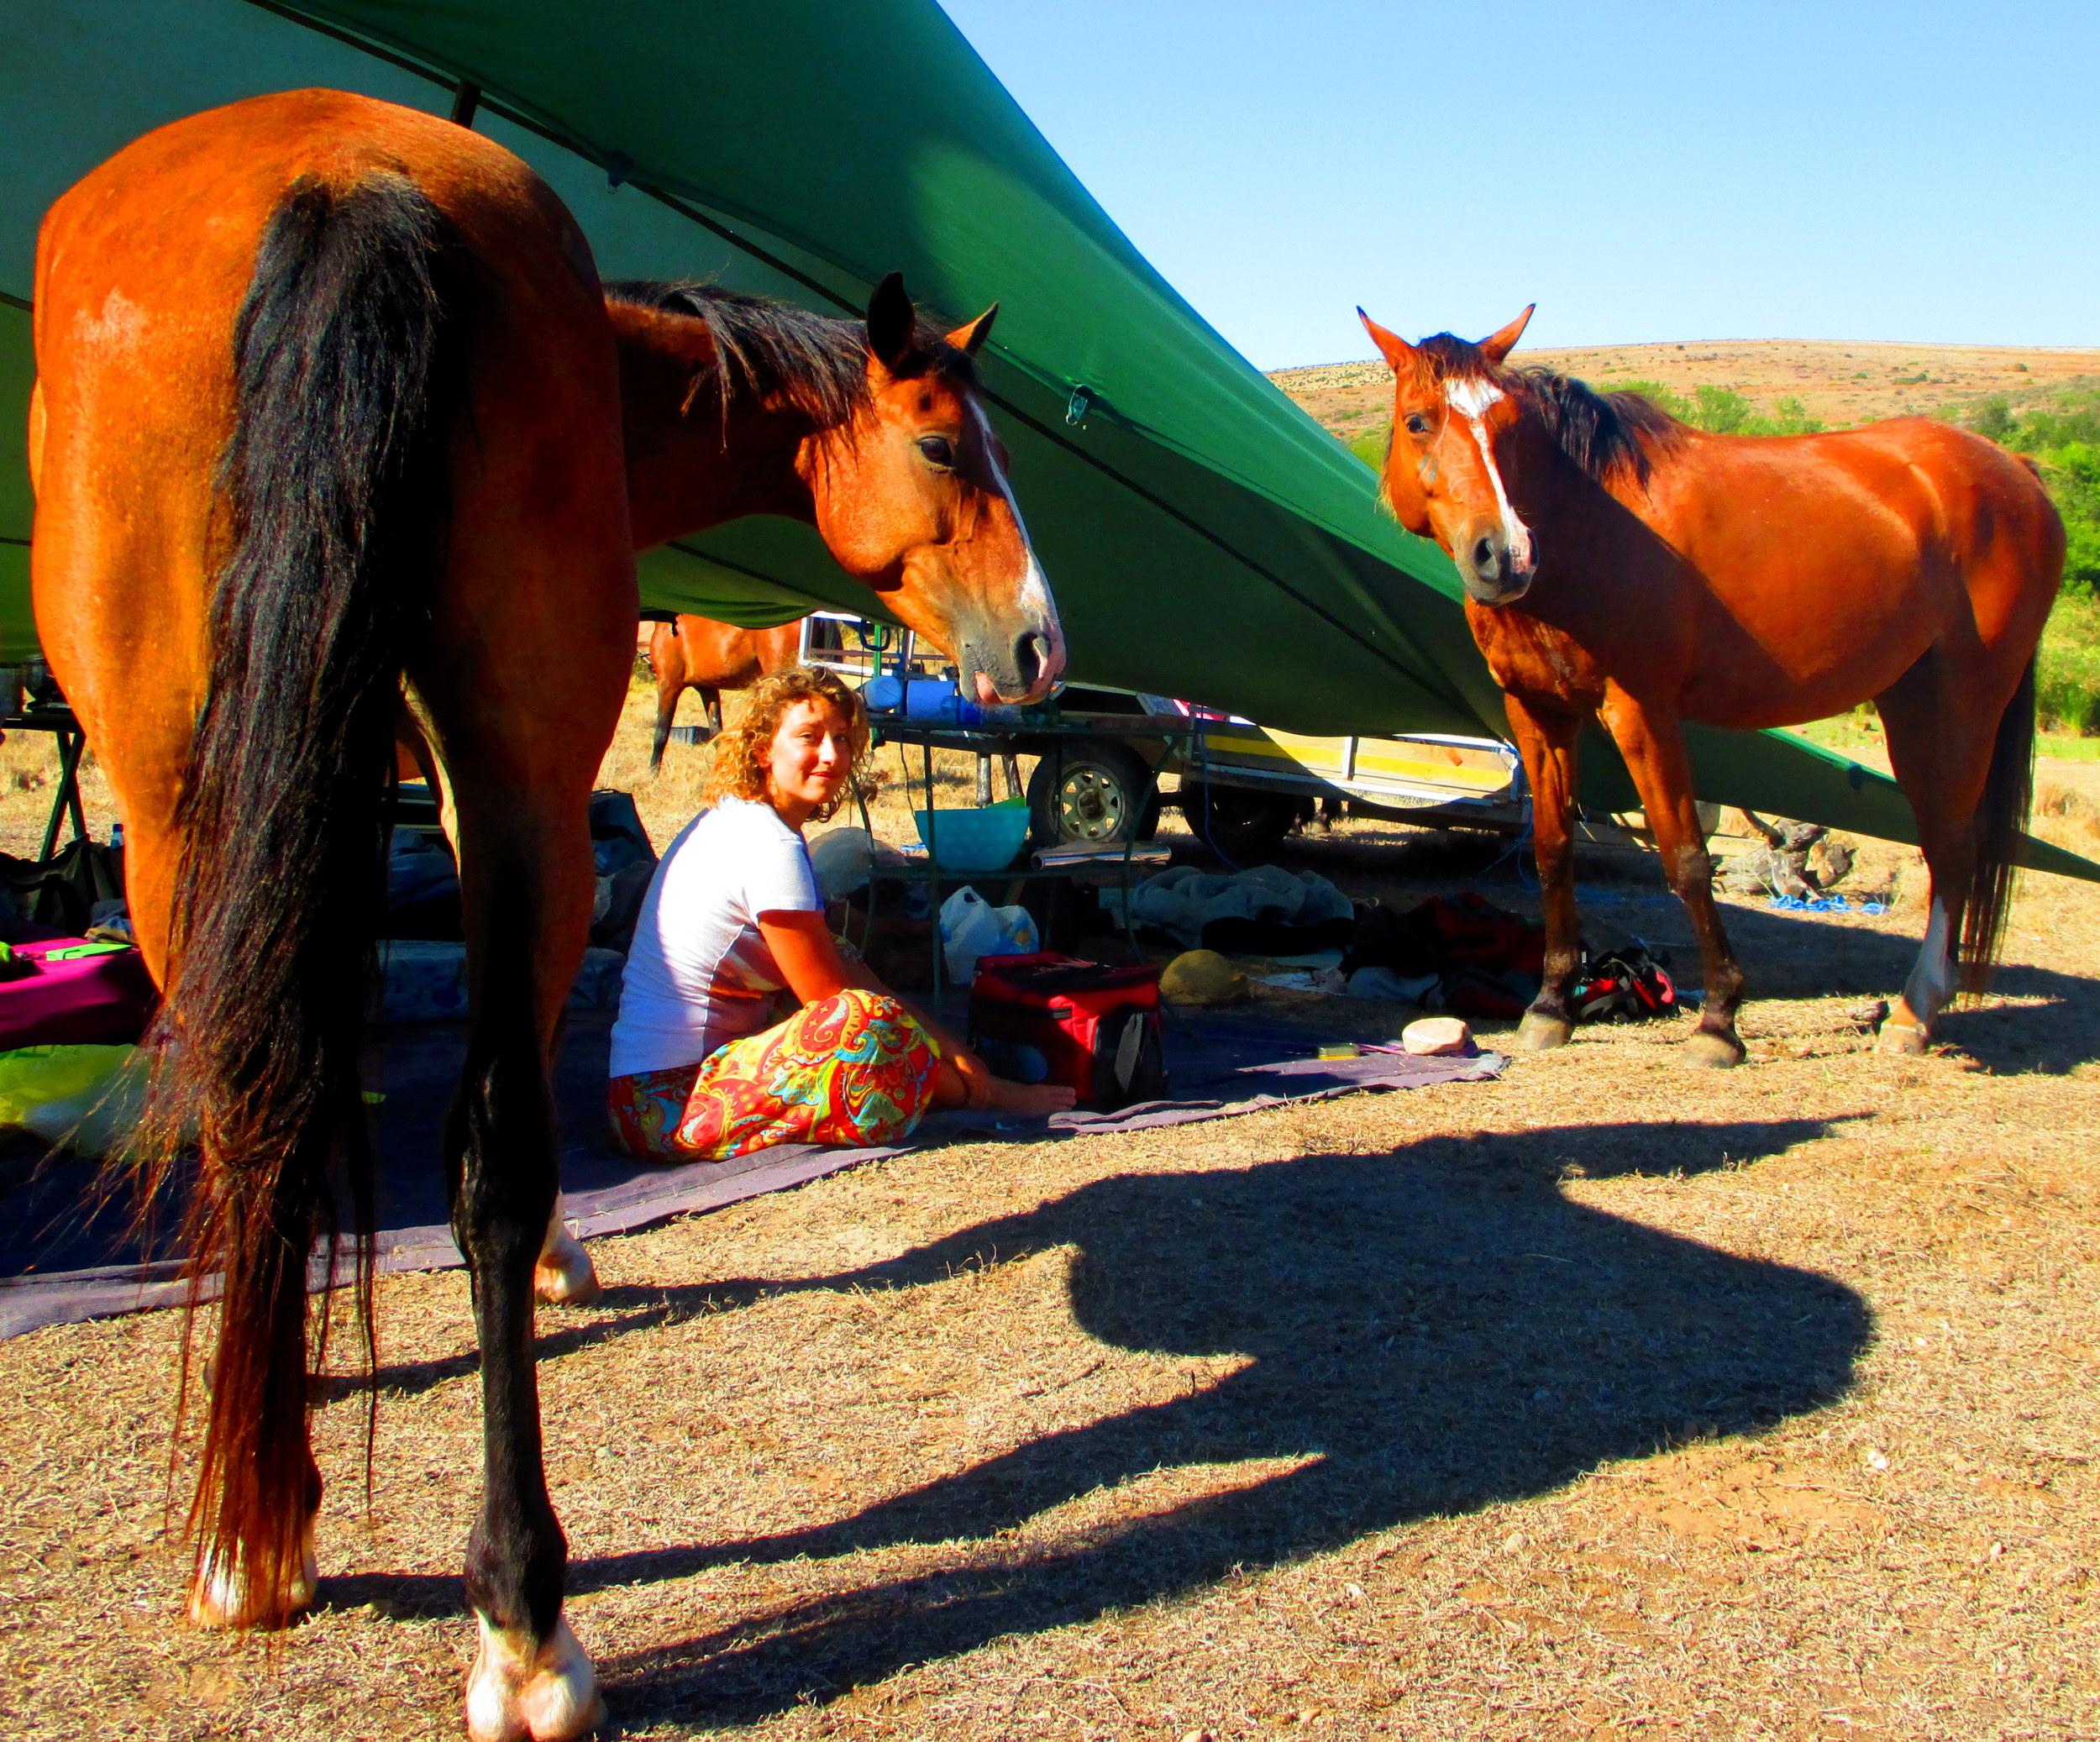 IMG_3310 Camping.jpg